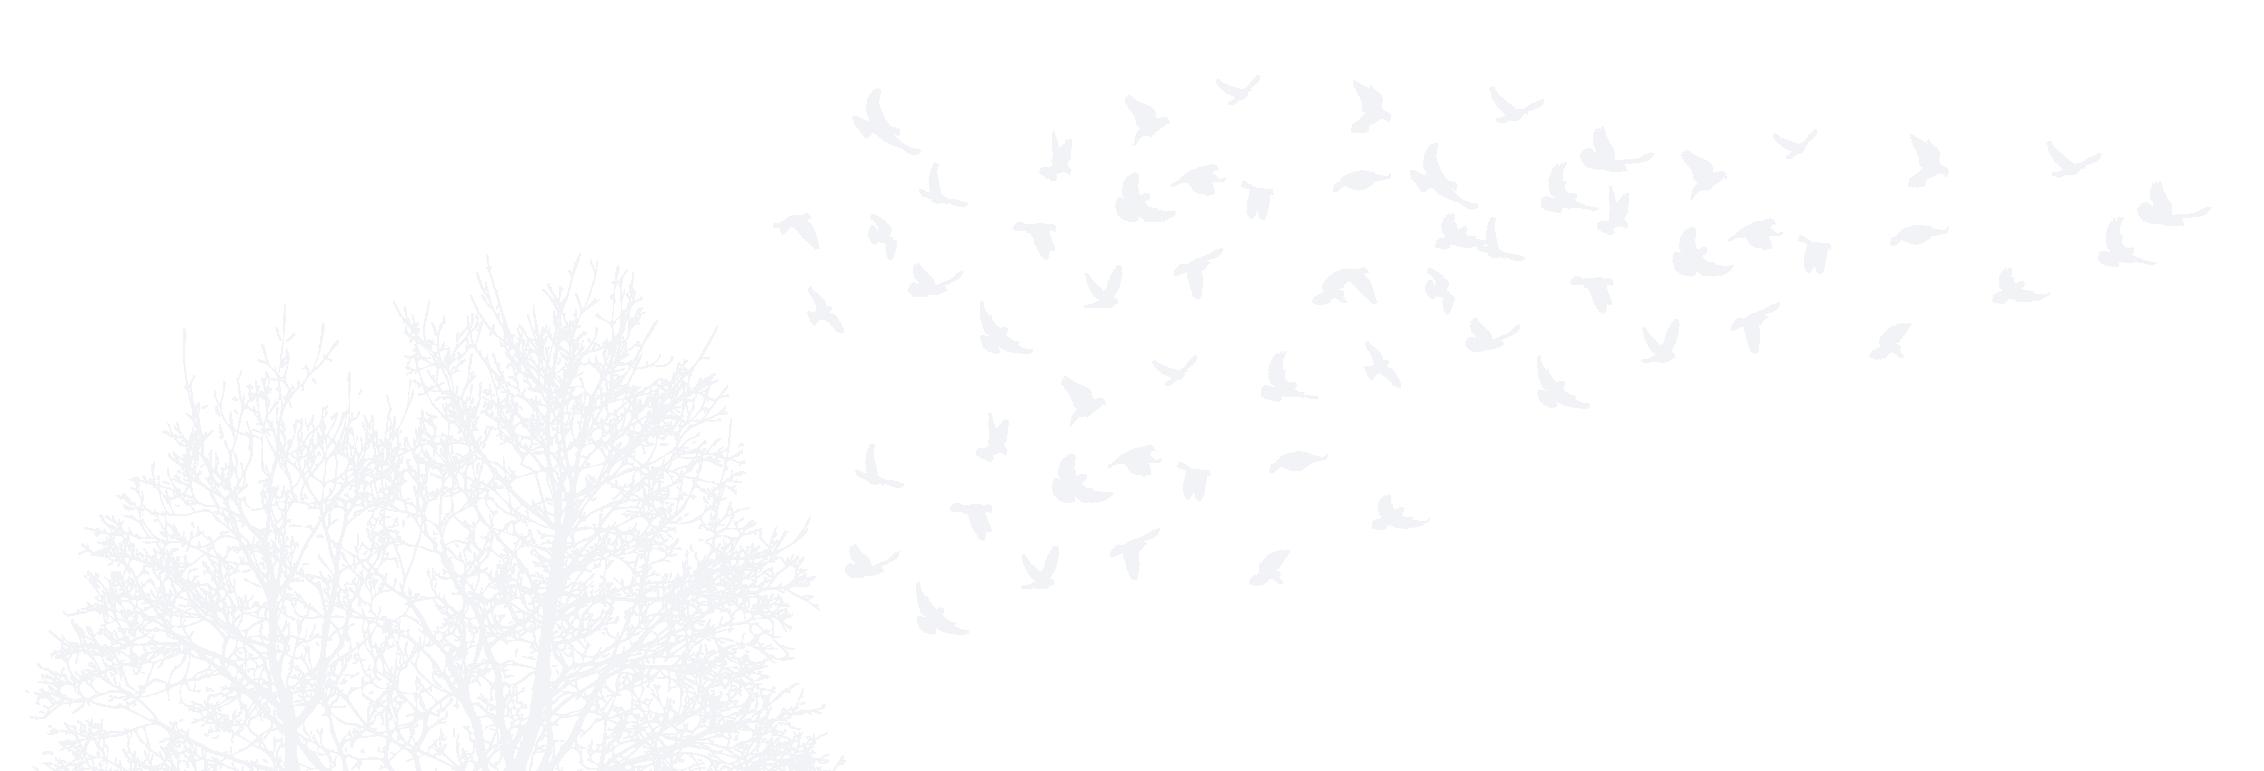 Birds flying over tree